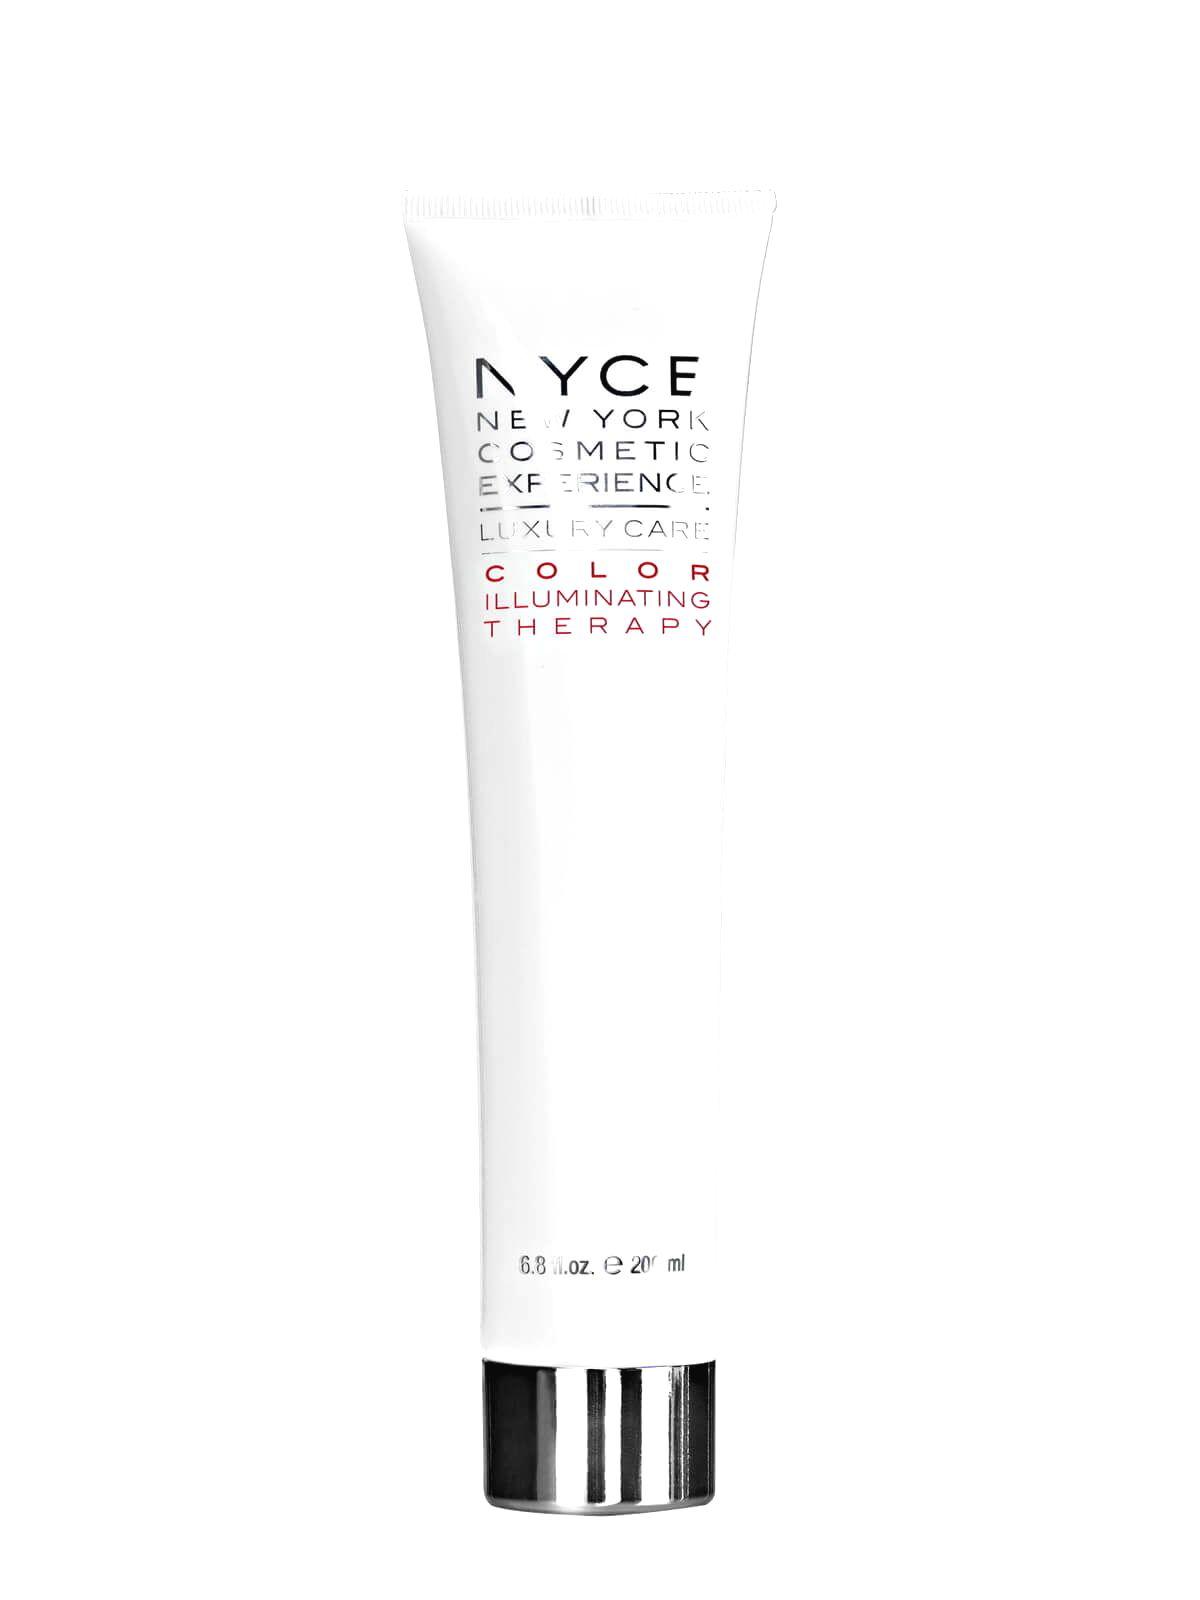 NYCE Maska pre farbené vlasy Color (Illuminating Therapy)200 ml